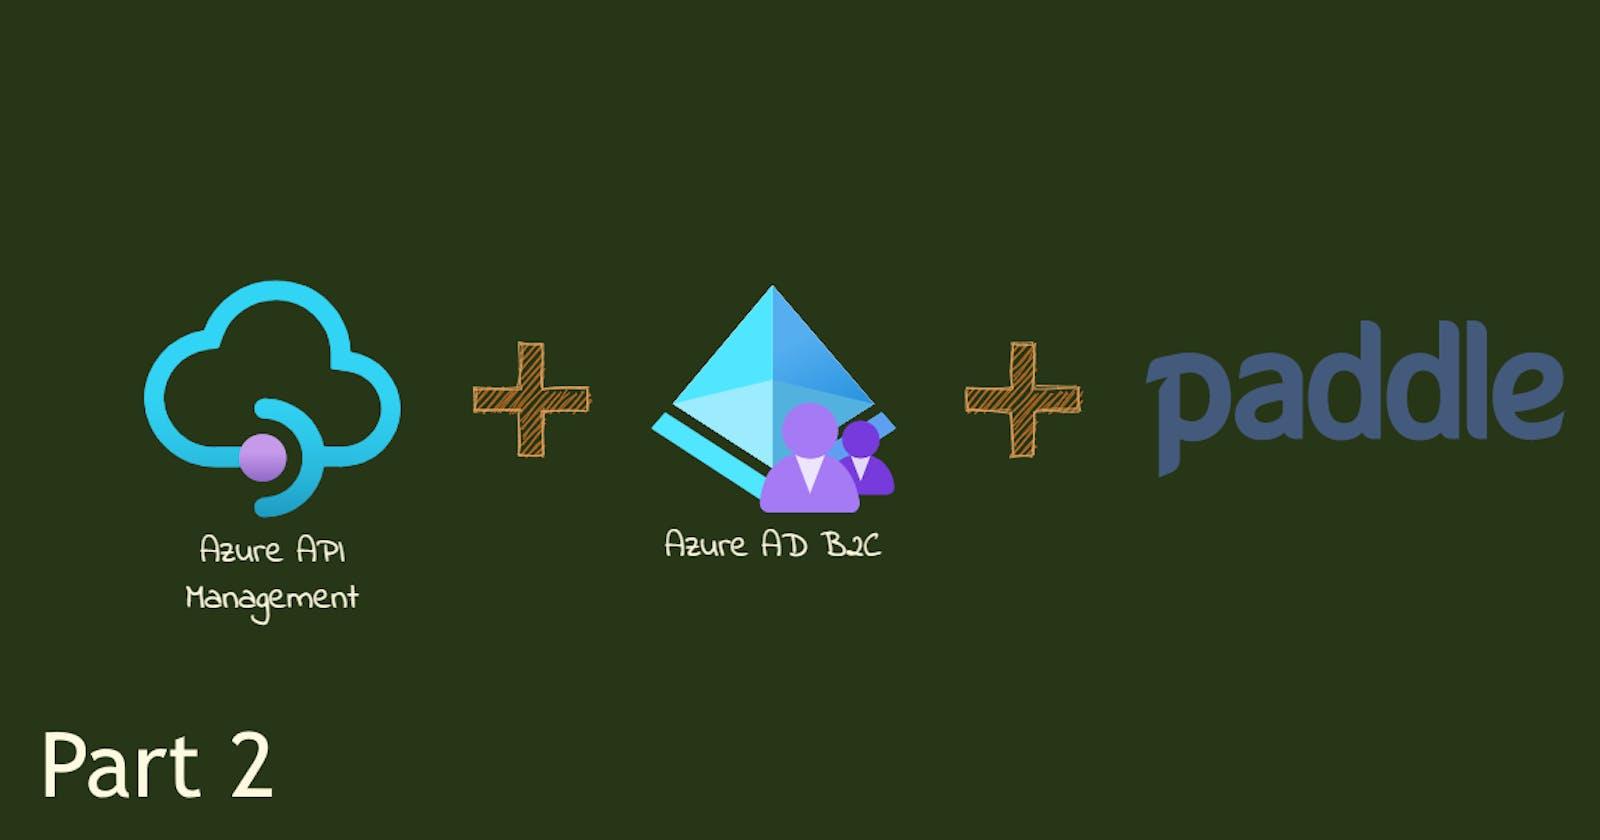 Connecting Azure API Management, Azure AD B2C, and Paddle with .net 5 Razor App, Part 2